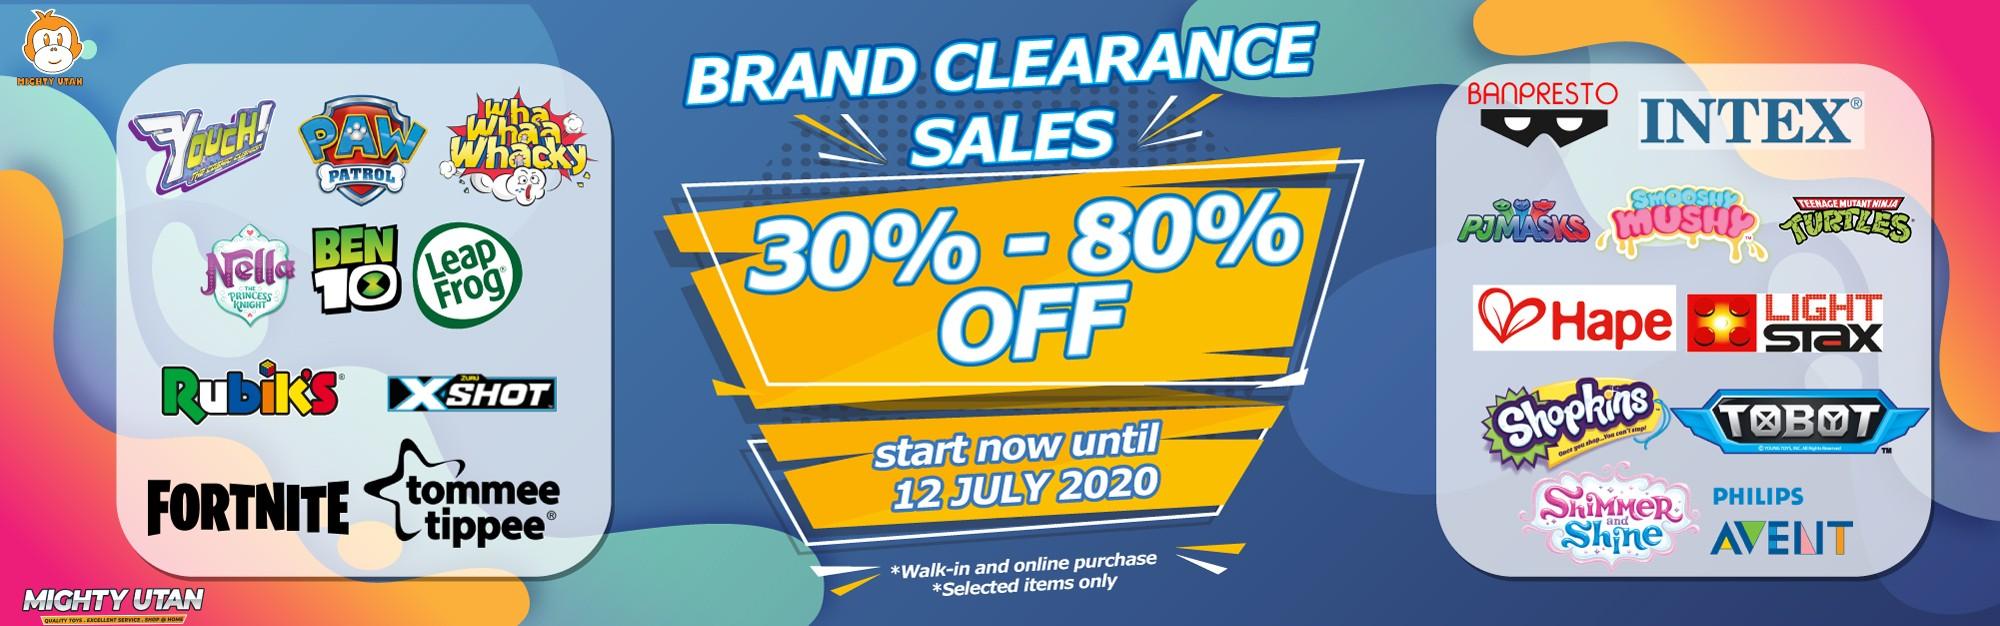 MU Brand Clearance Sales